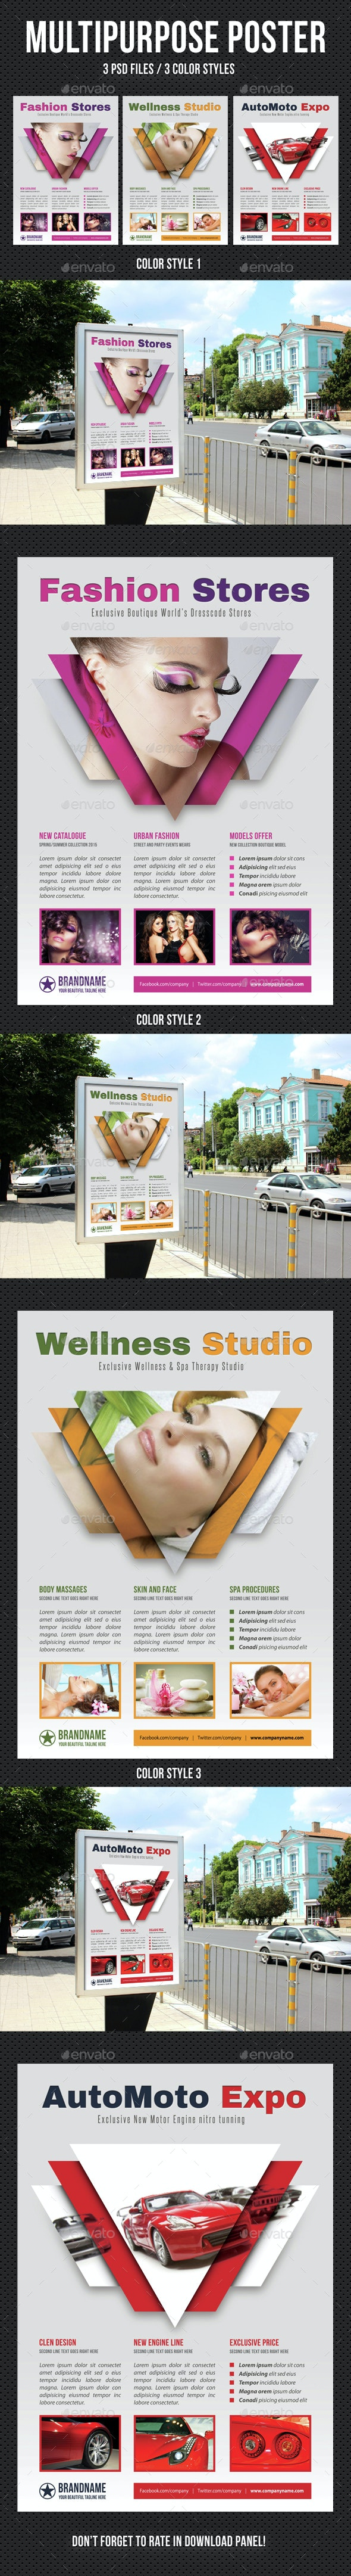 Multipurpose Flexible Poster 03 - Signage Print Templates